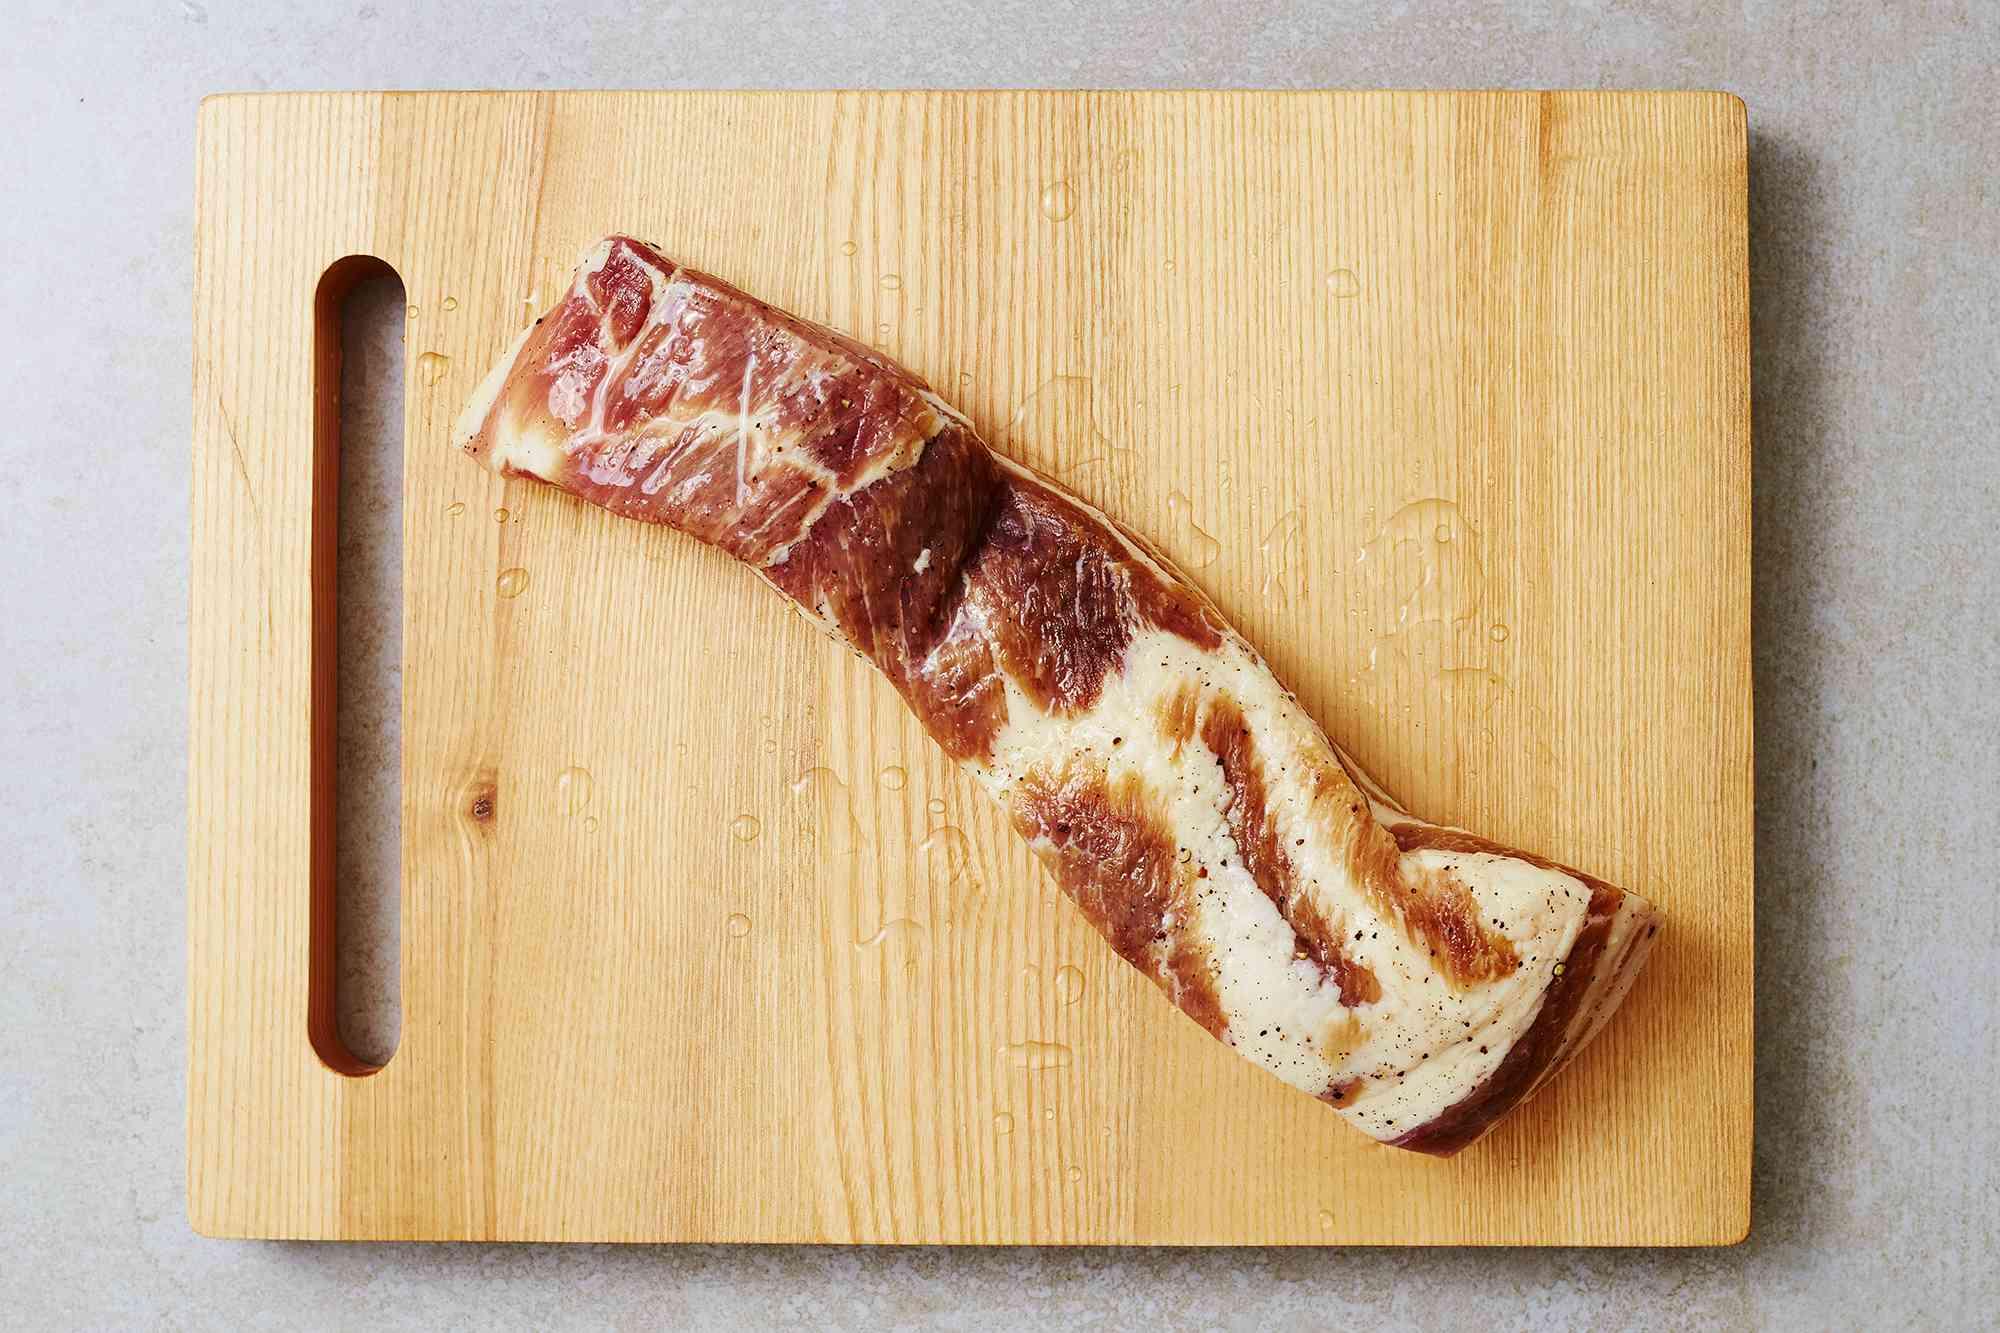 rinsed pork belly on a wood board